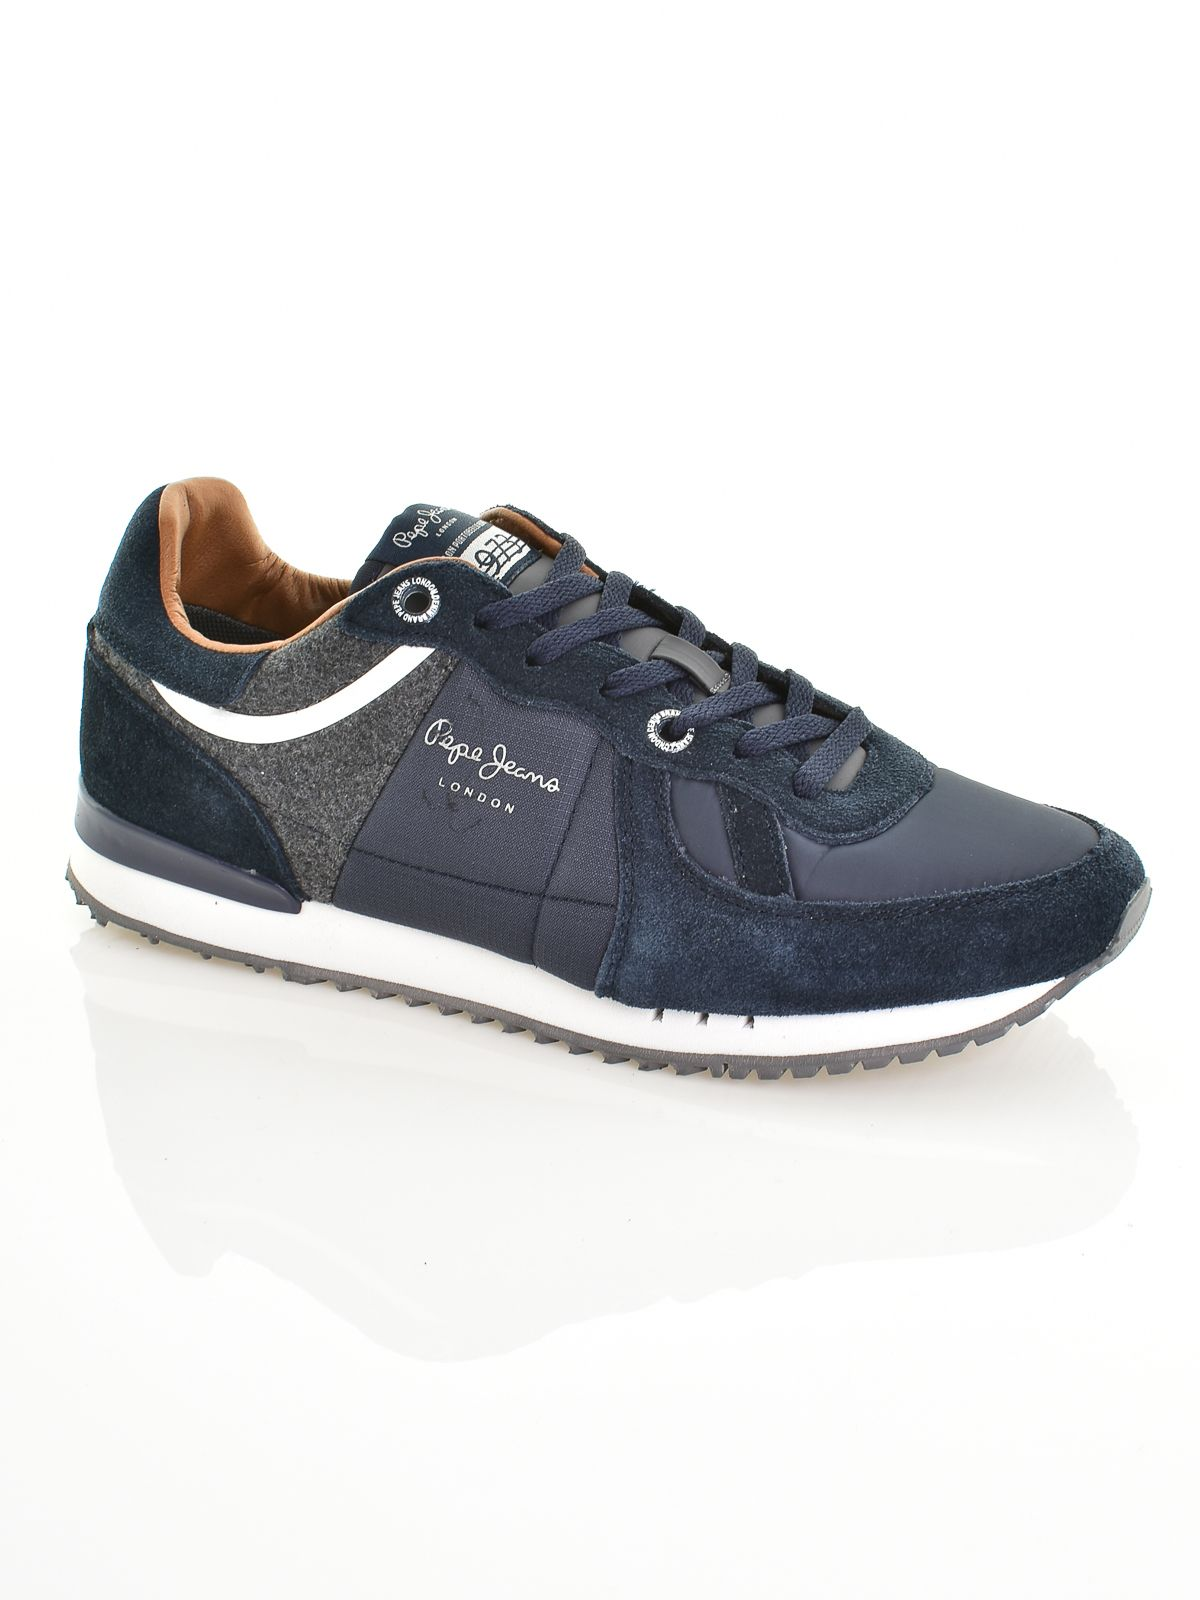 Férfi - Cipő - Utcai cipő Pepe Jeans 4f88ff50b5